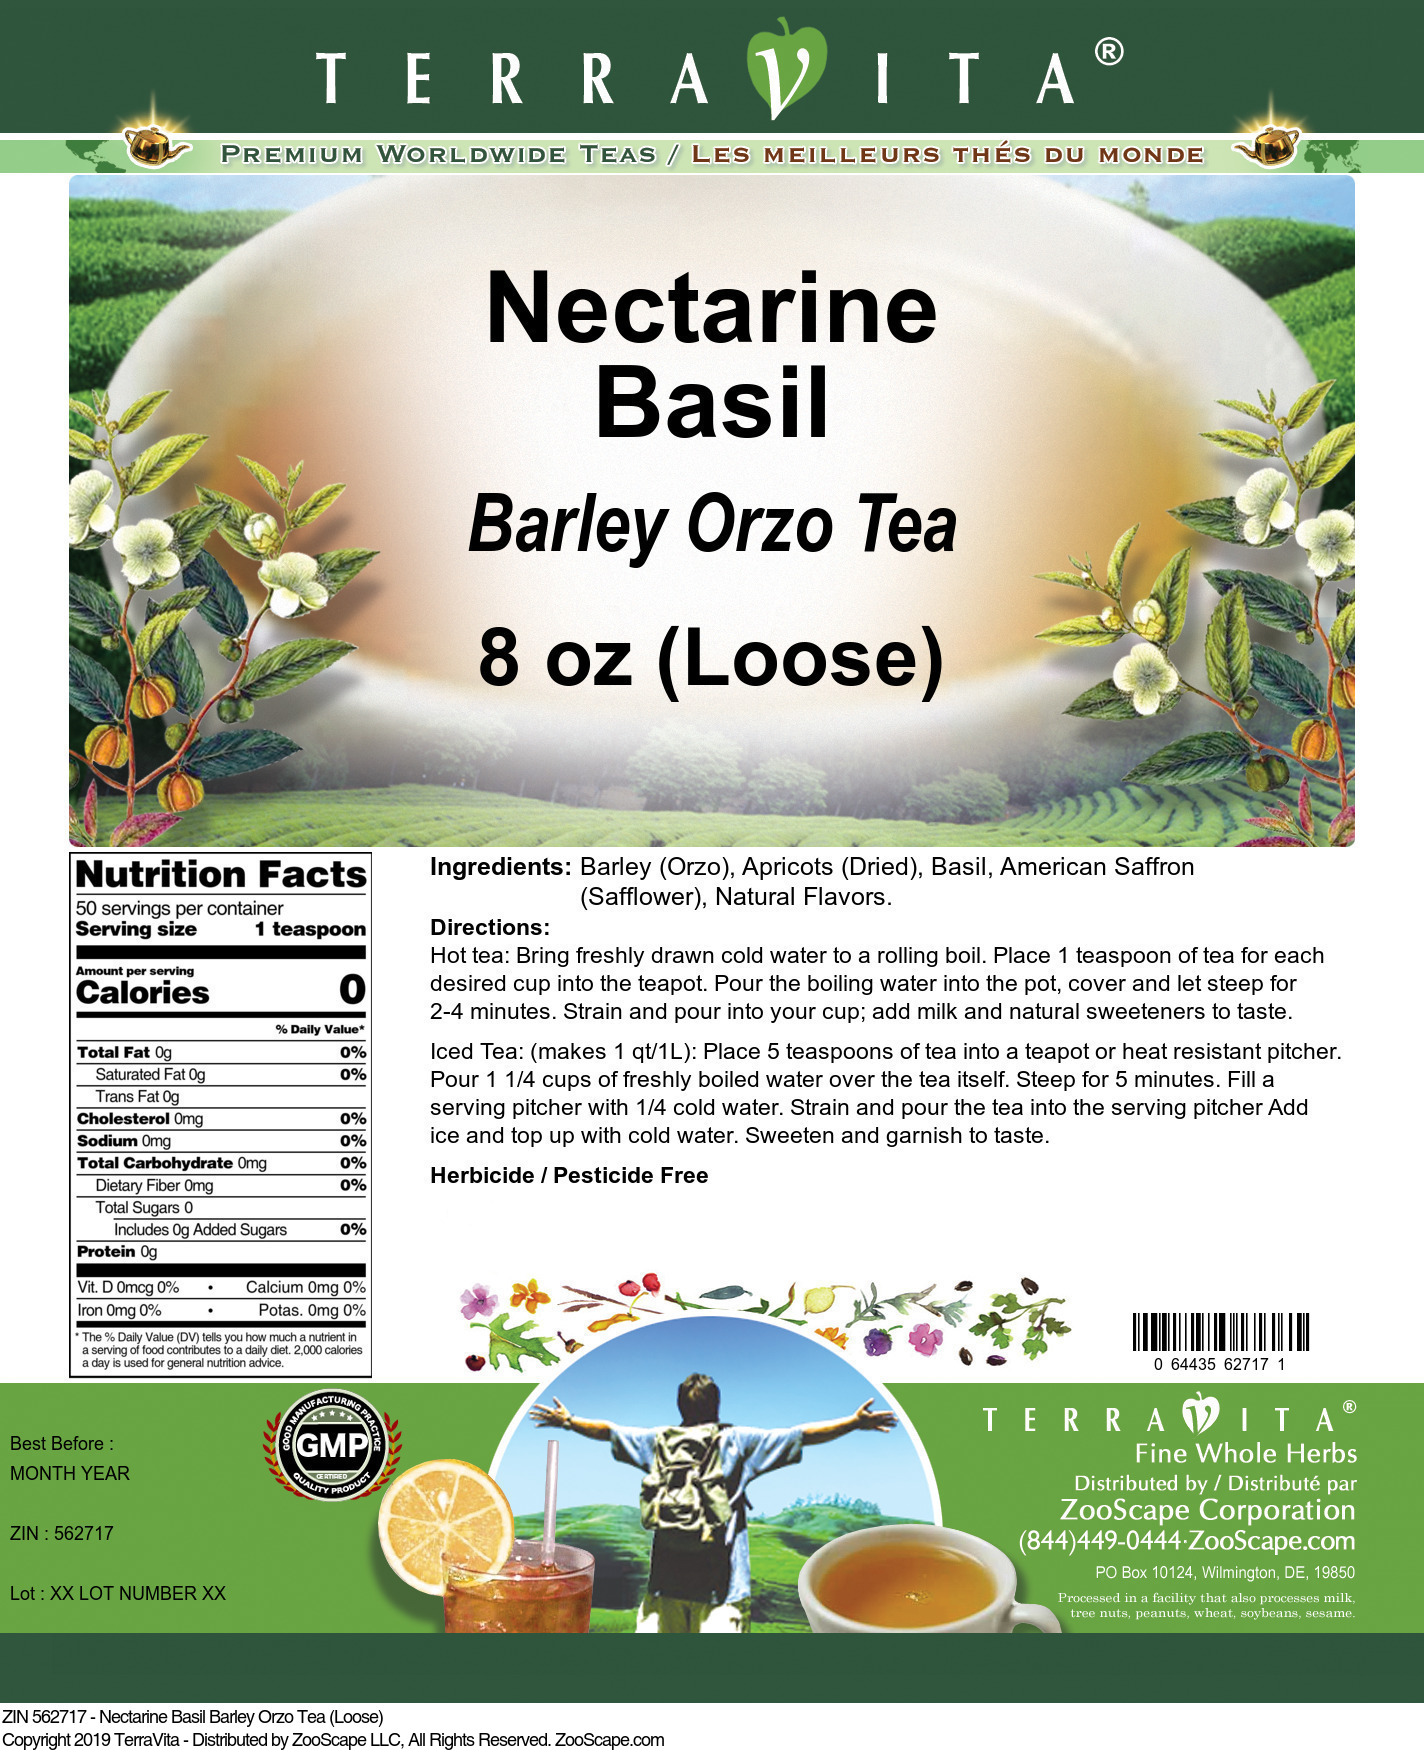 Nectarine Basil Barley Orzo Tea (Loose)